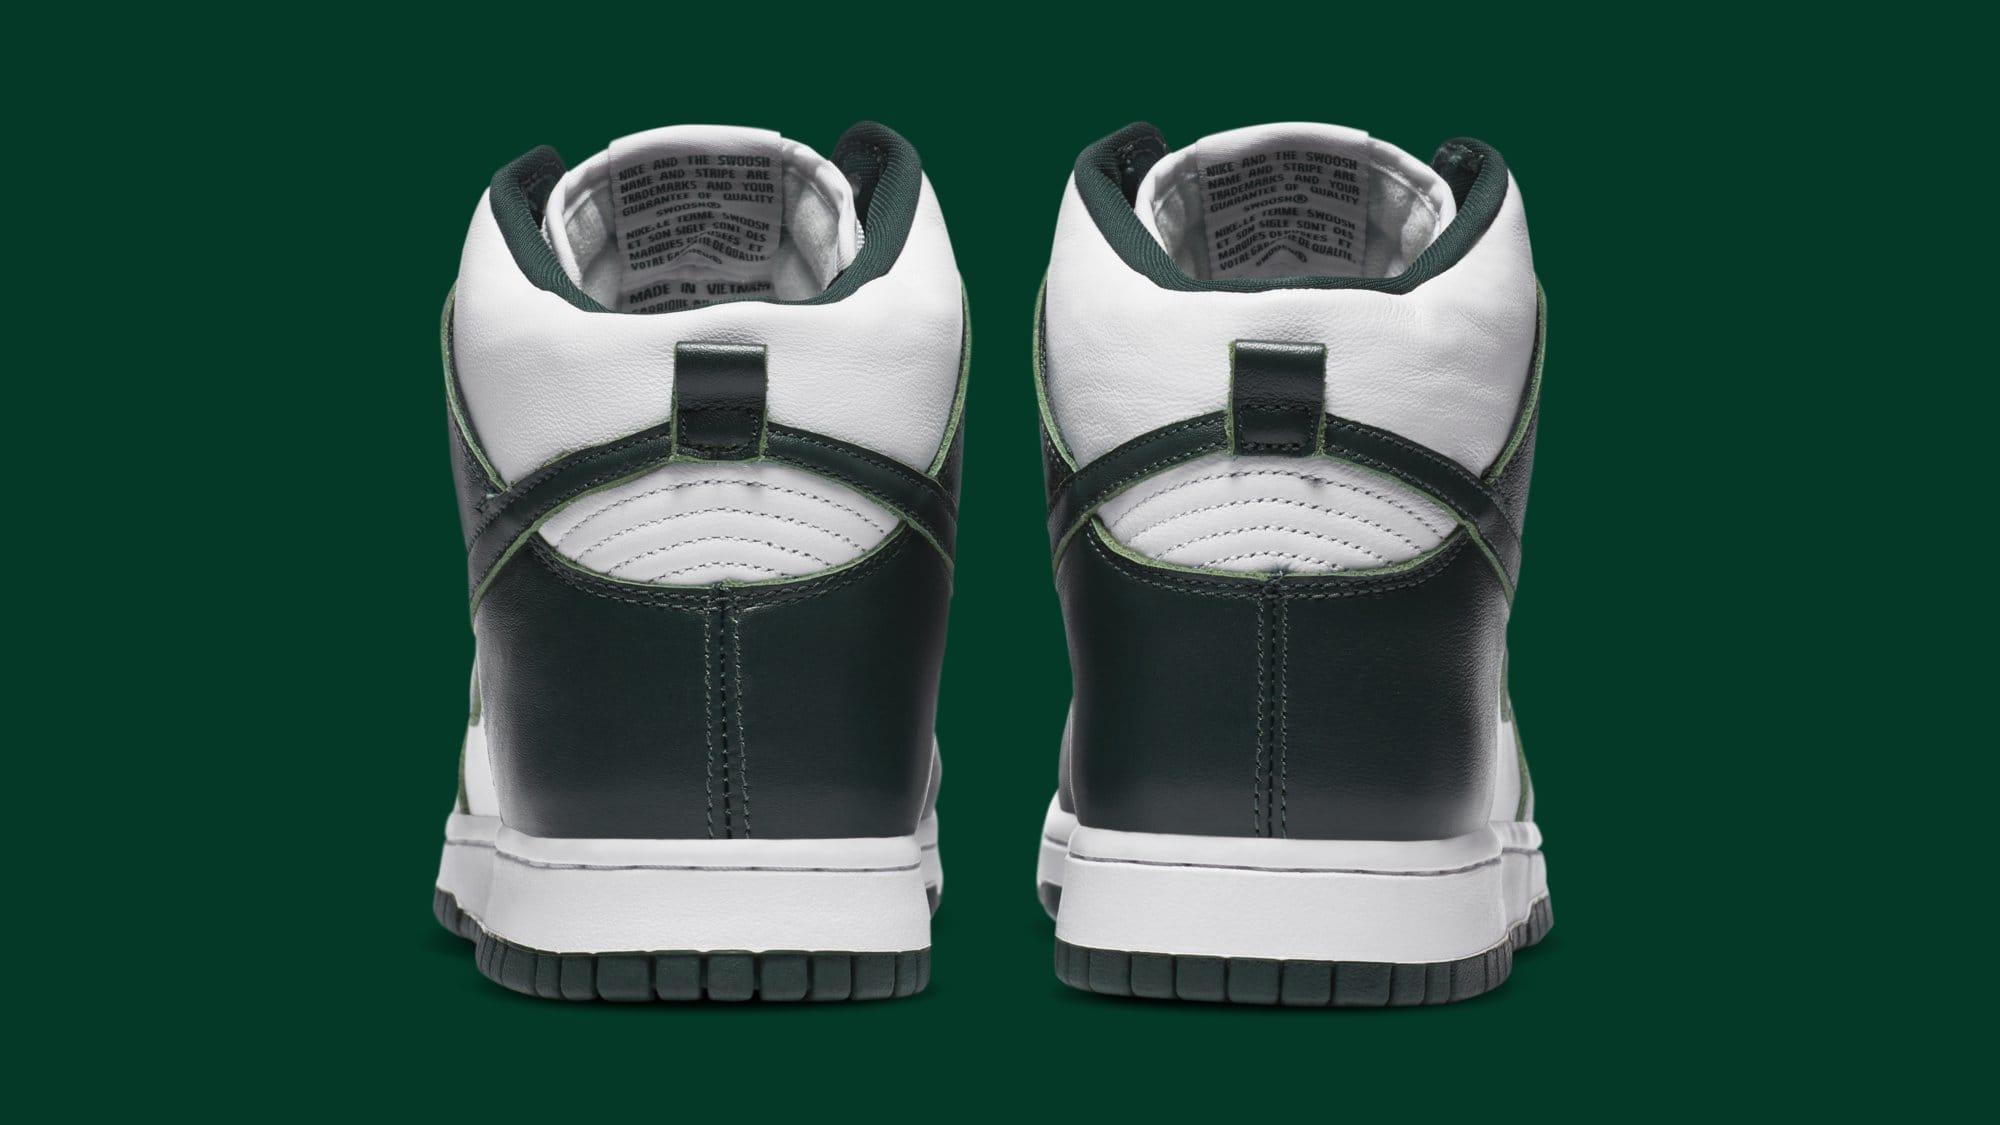 Nike Dunk High SP 'Pro Green' CZ8149-100 Heel